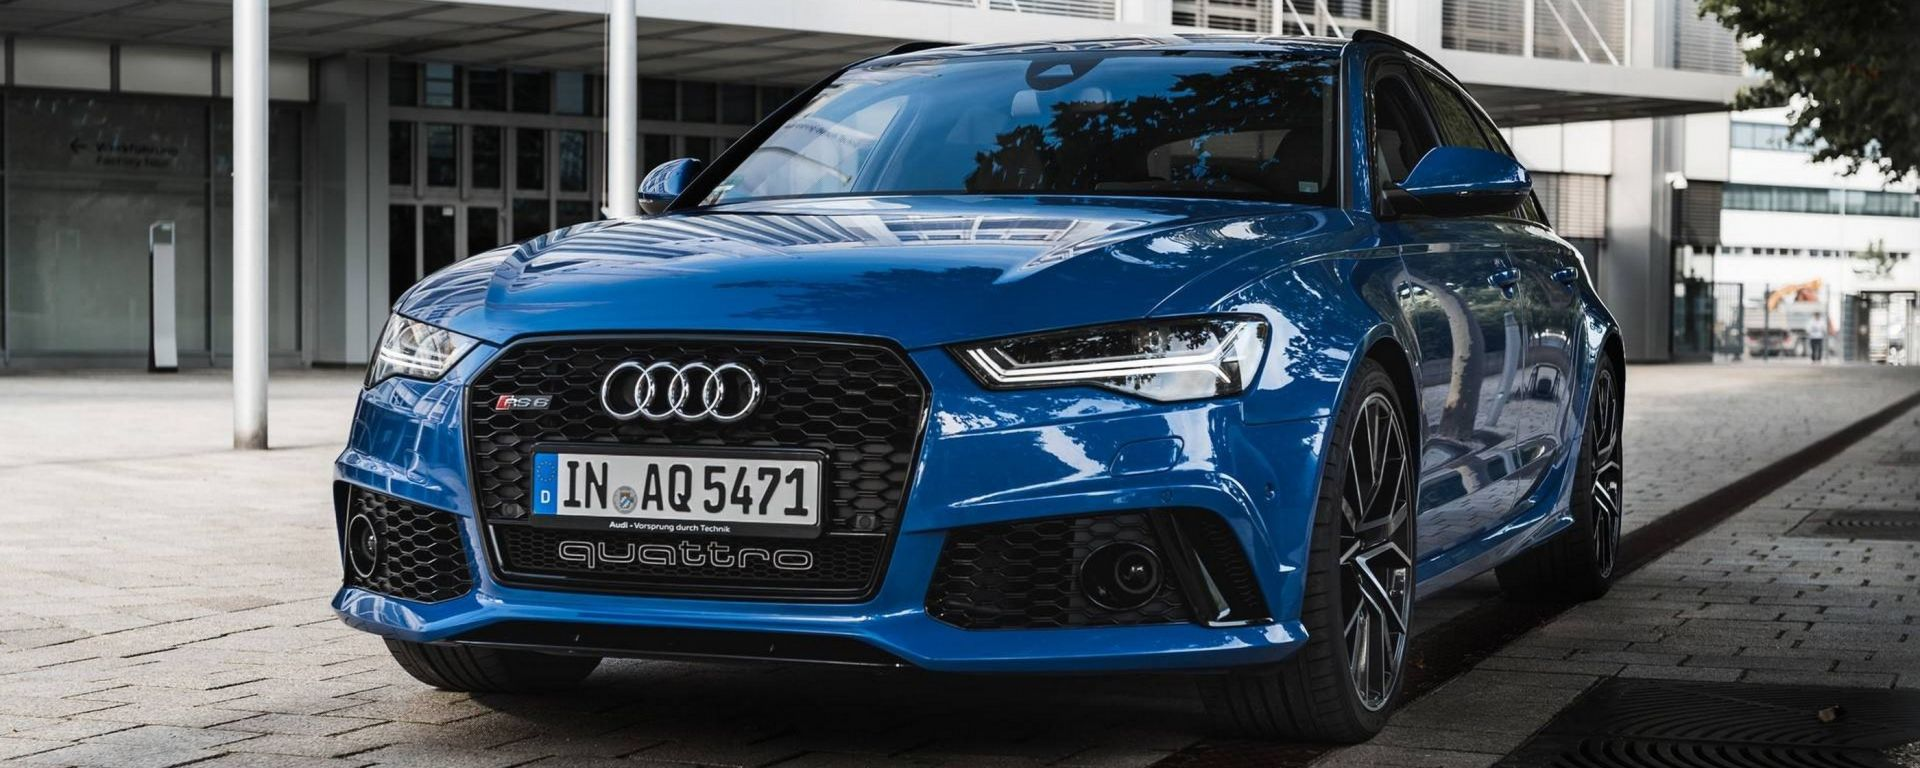 Audi RS6 Performance Nogaro: con ABT ha 700 CV